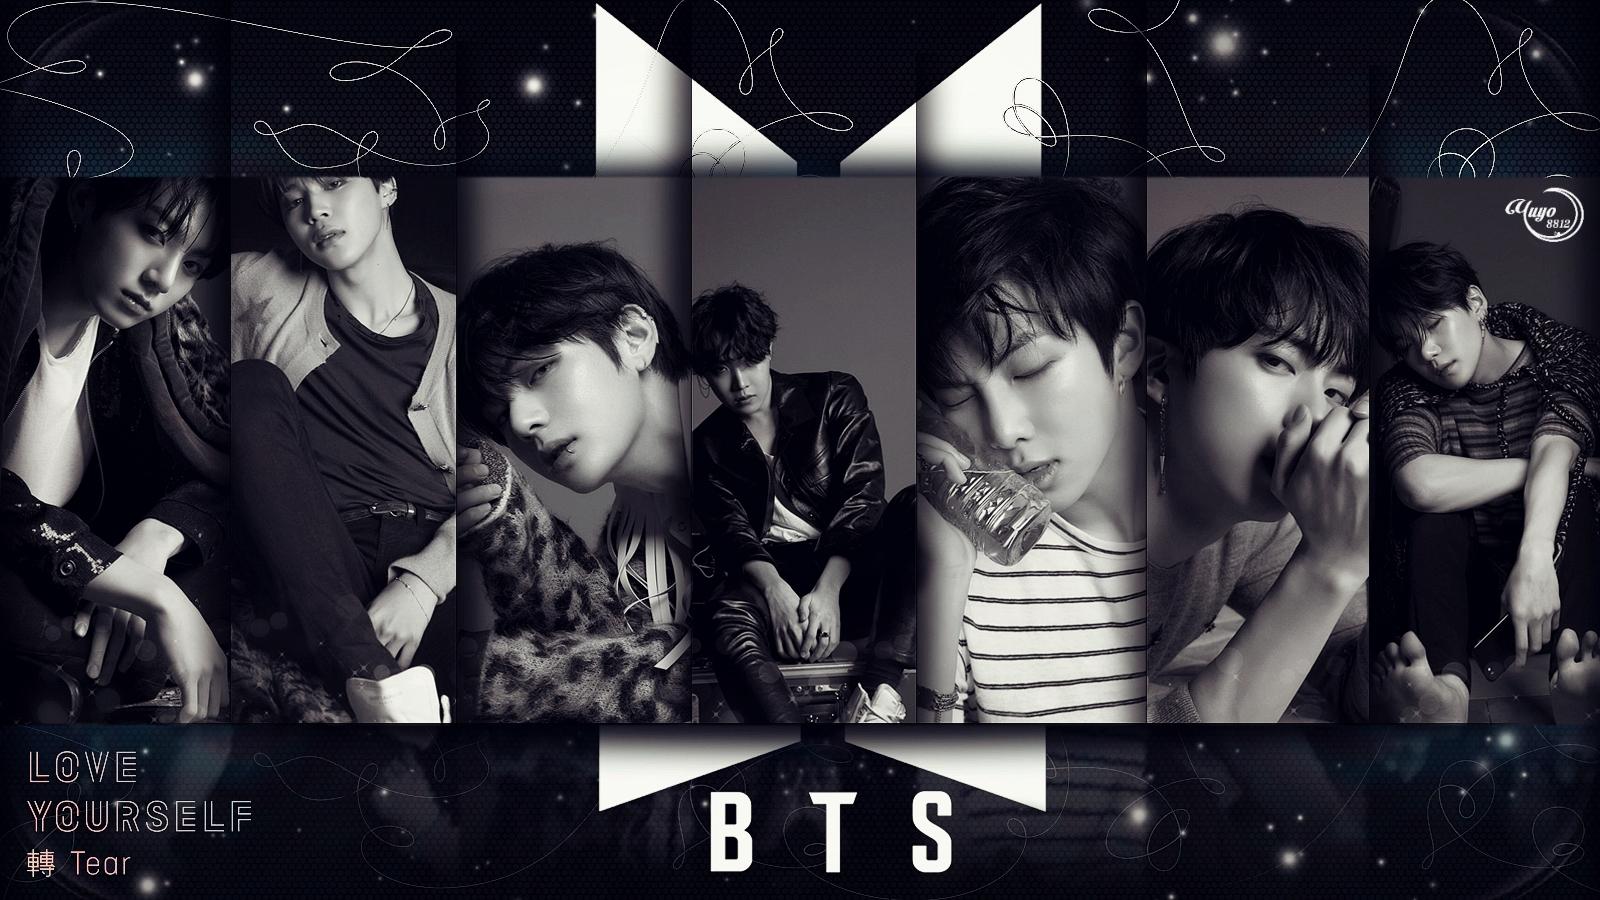 BTS FAKE LOVE WALLPAPER yulliyo8812 Wallpaper 41349111